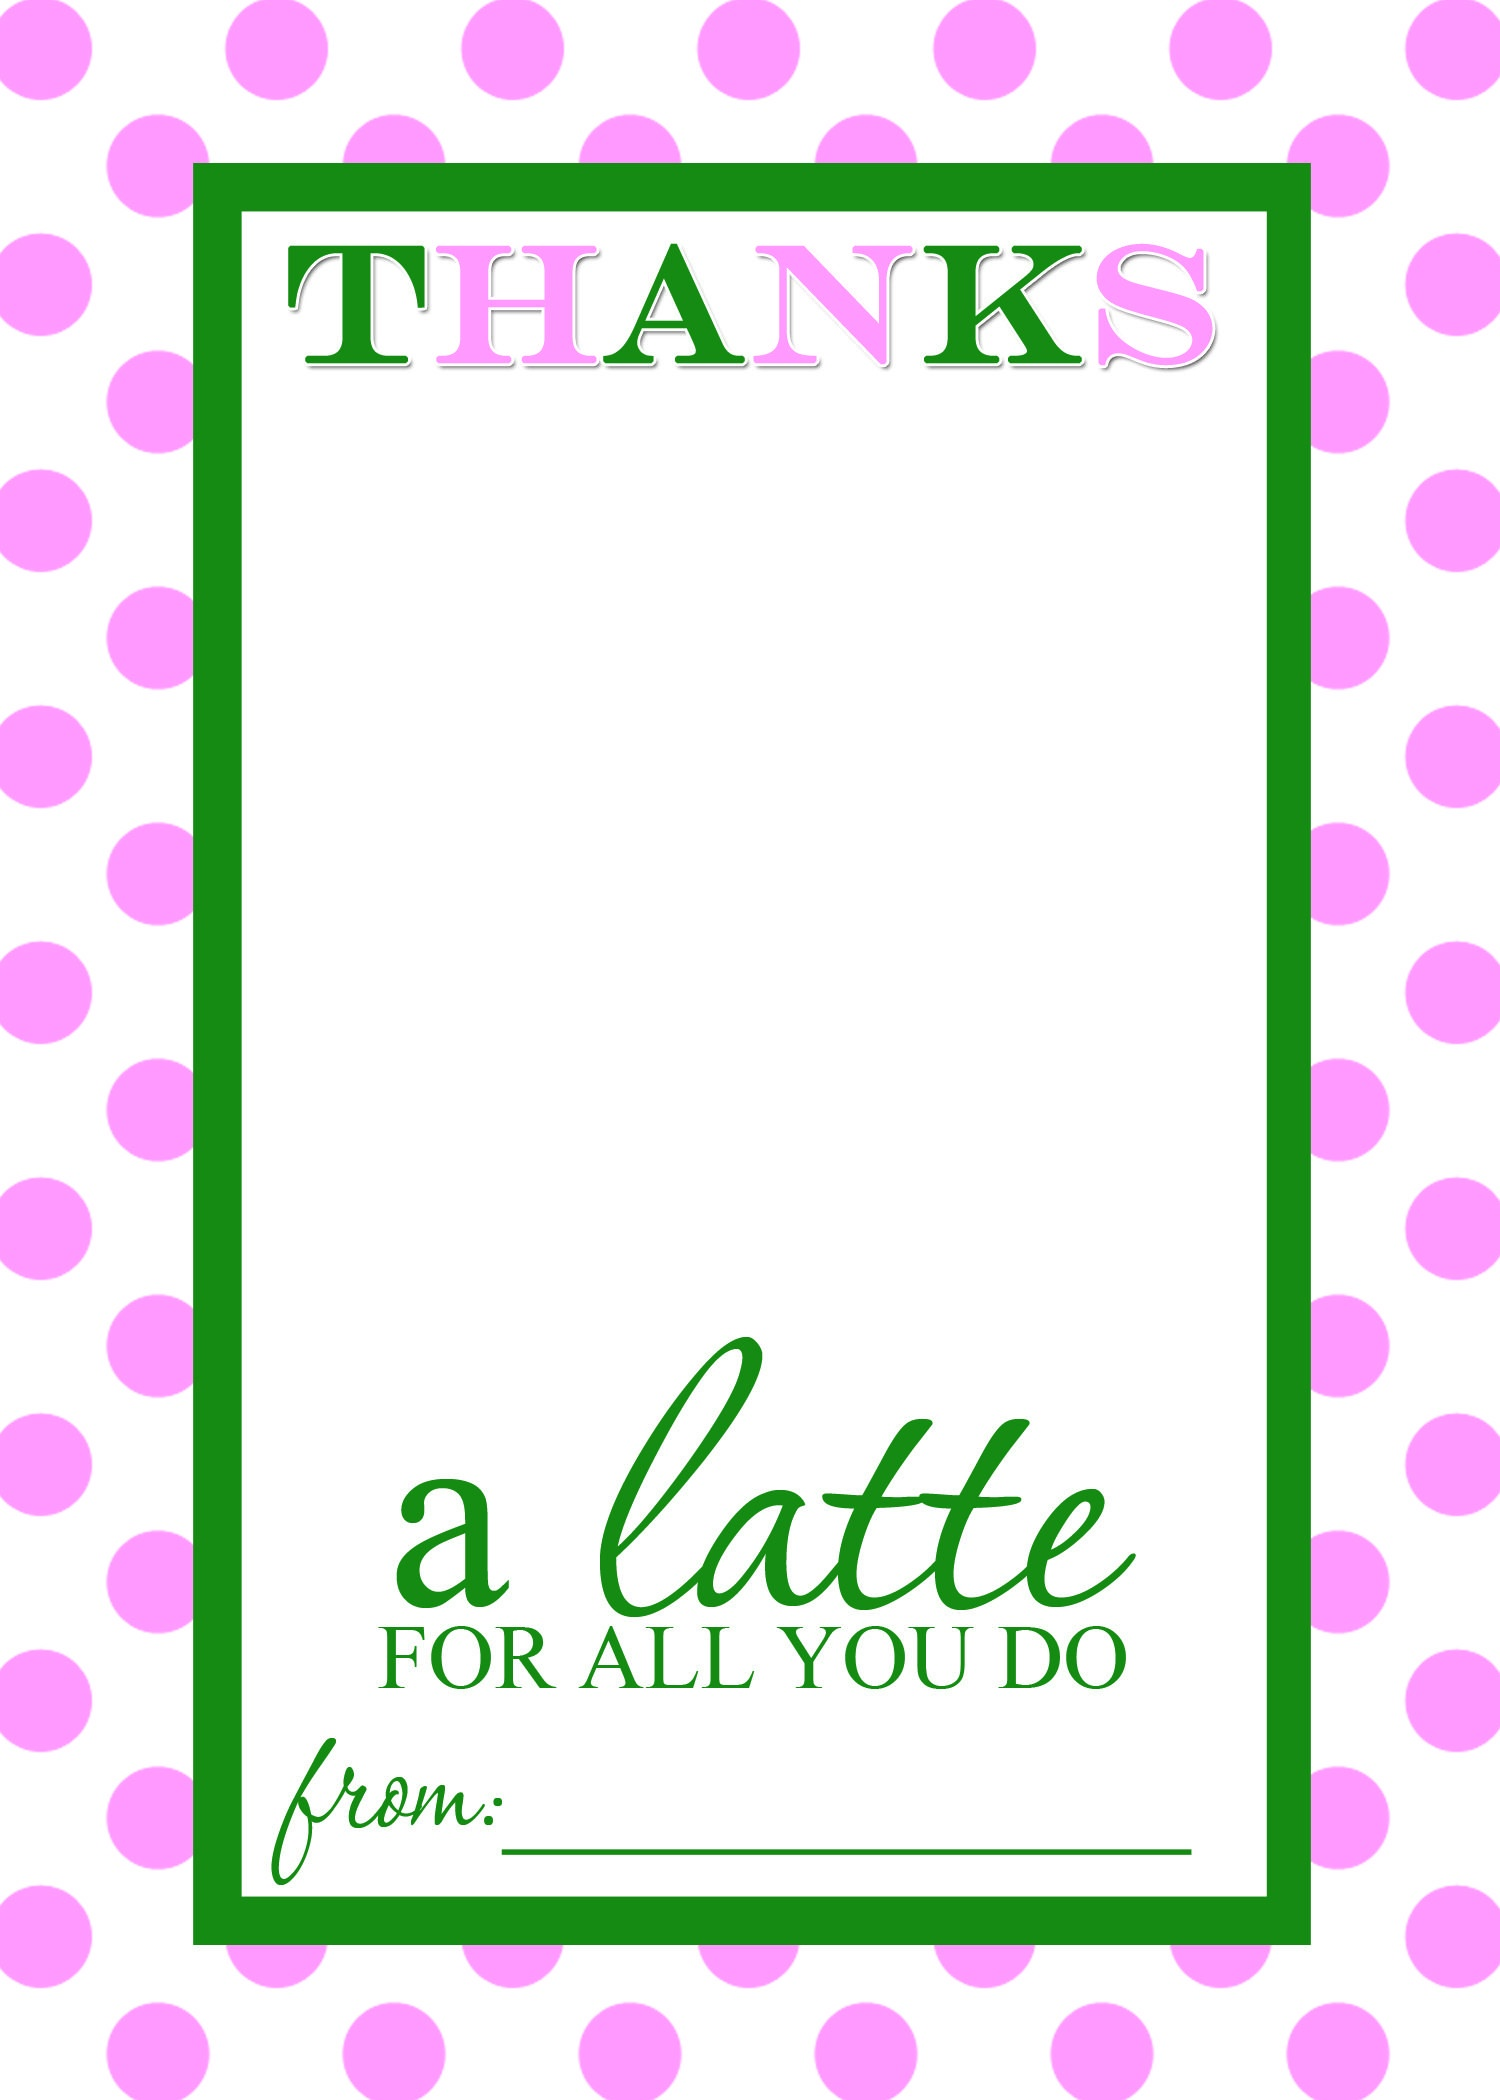 Thanks A Latte Free Printable Gift Card Holder Teacher Gift   Diy - Thanks A Latte Free Printable